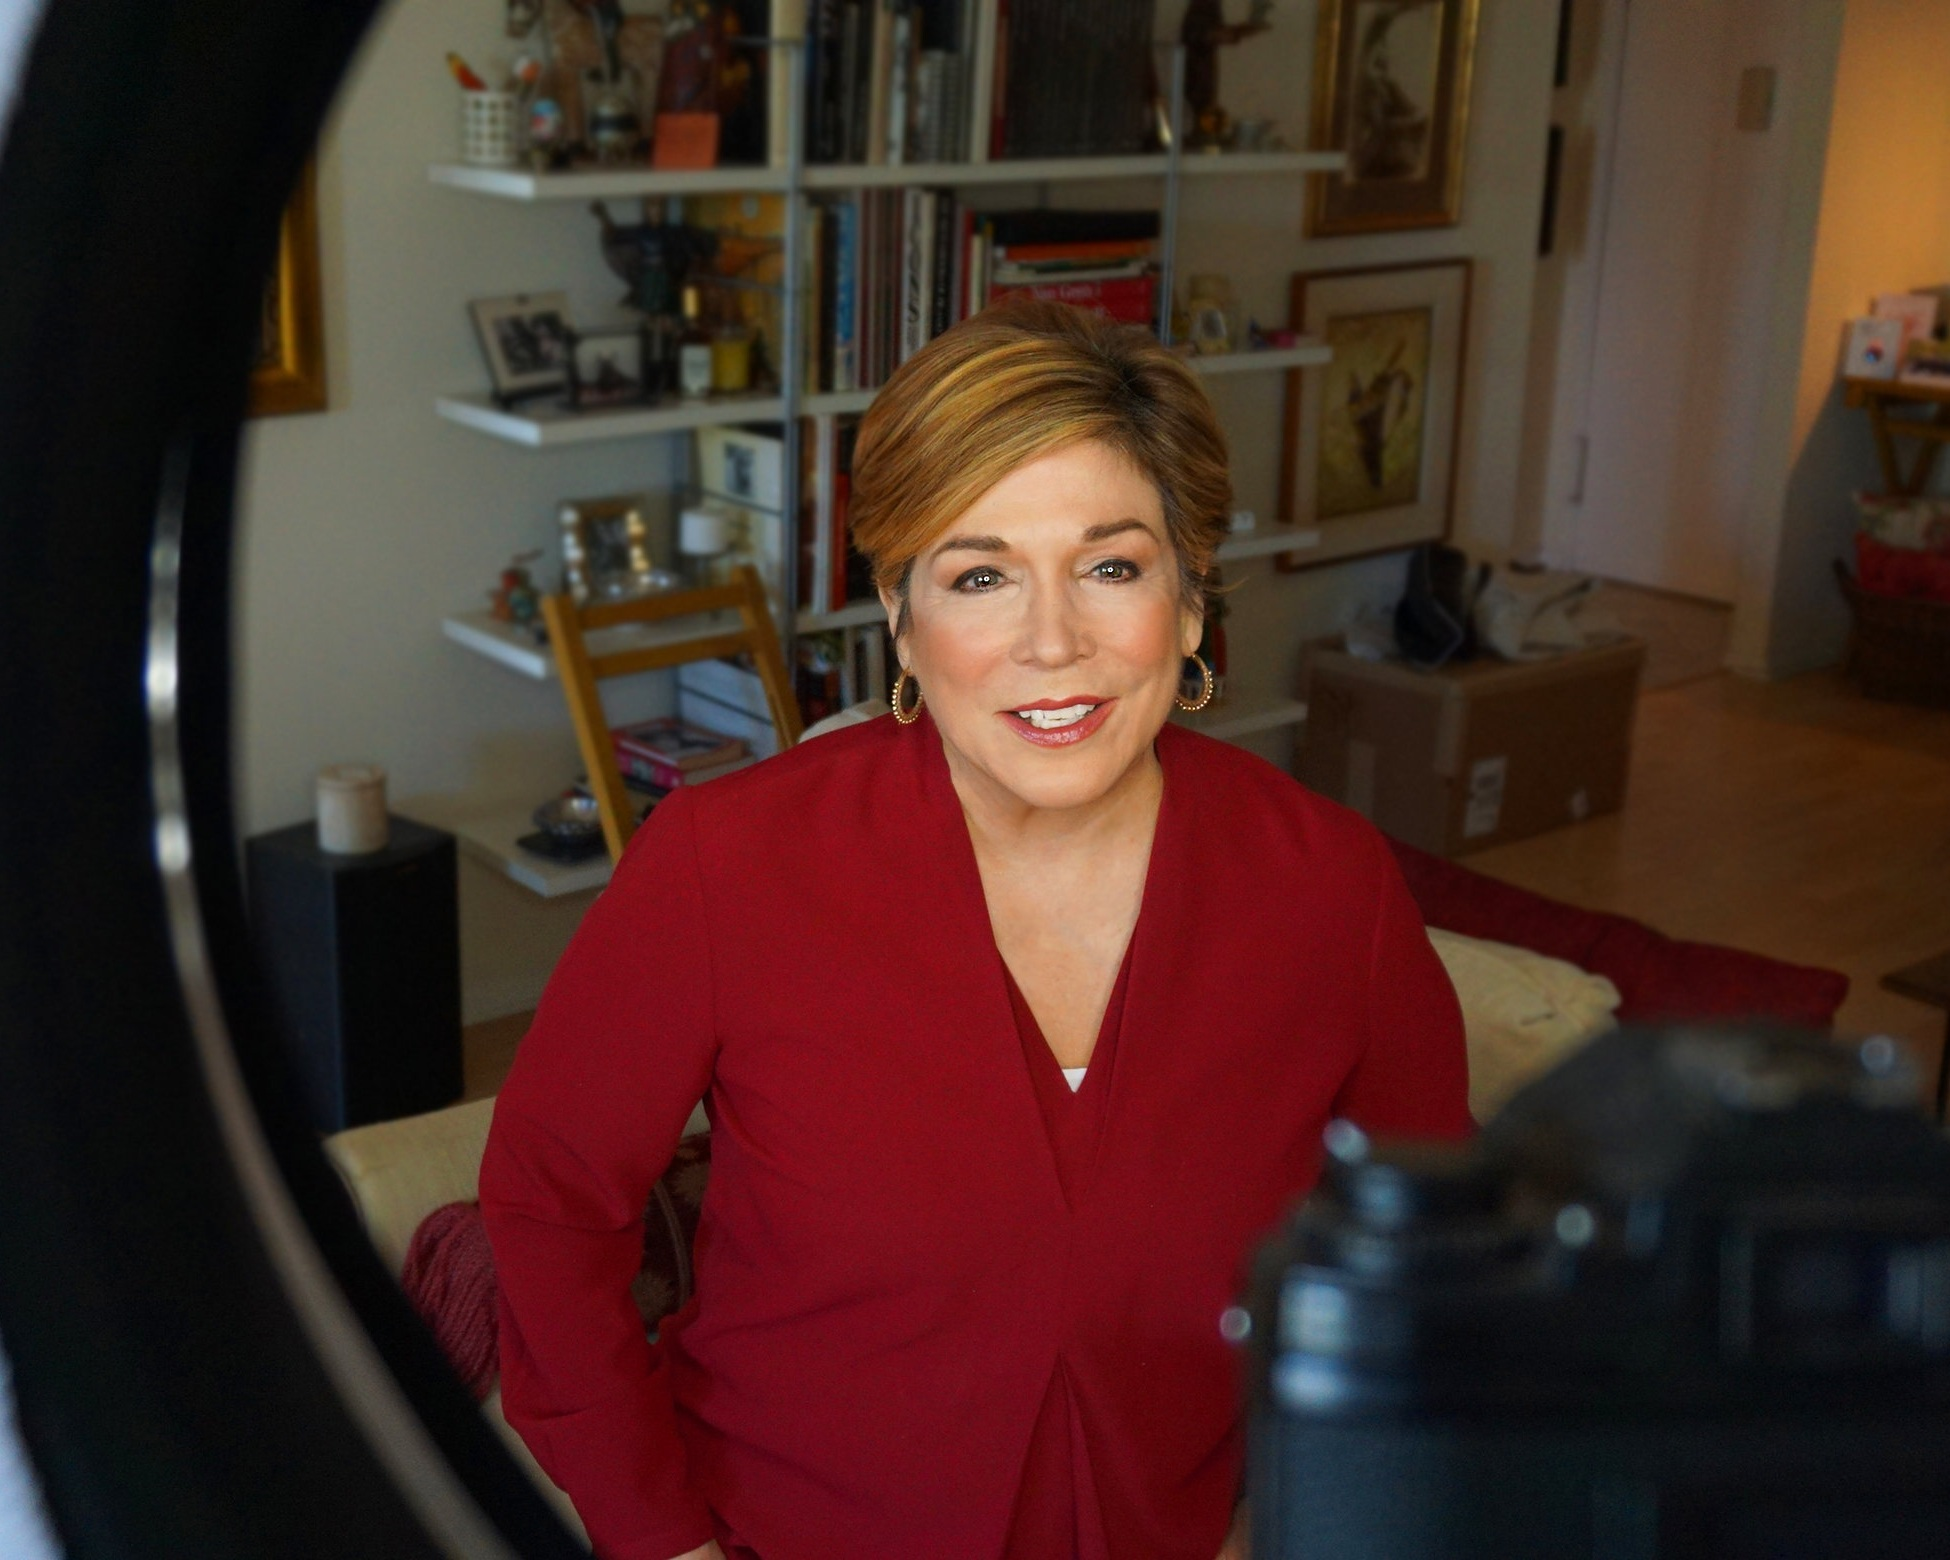 Denisse Oller NYC NJ CT Professional Media Training Award Winning Journalist